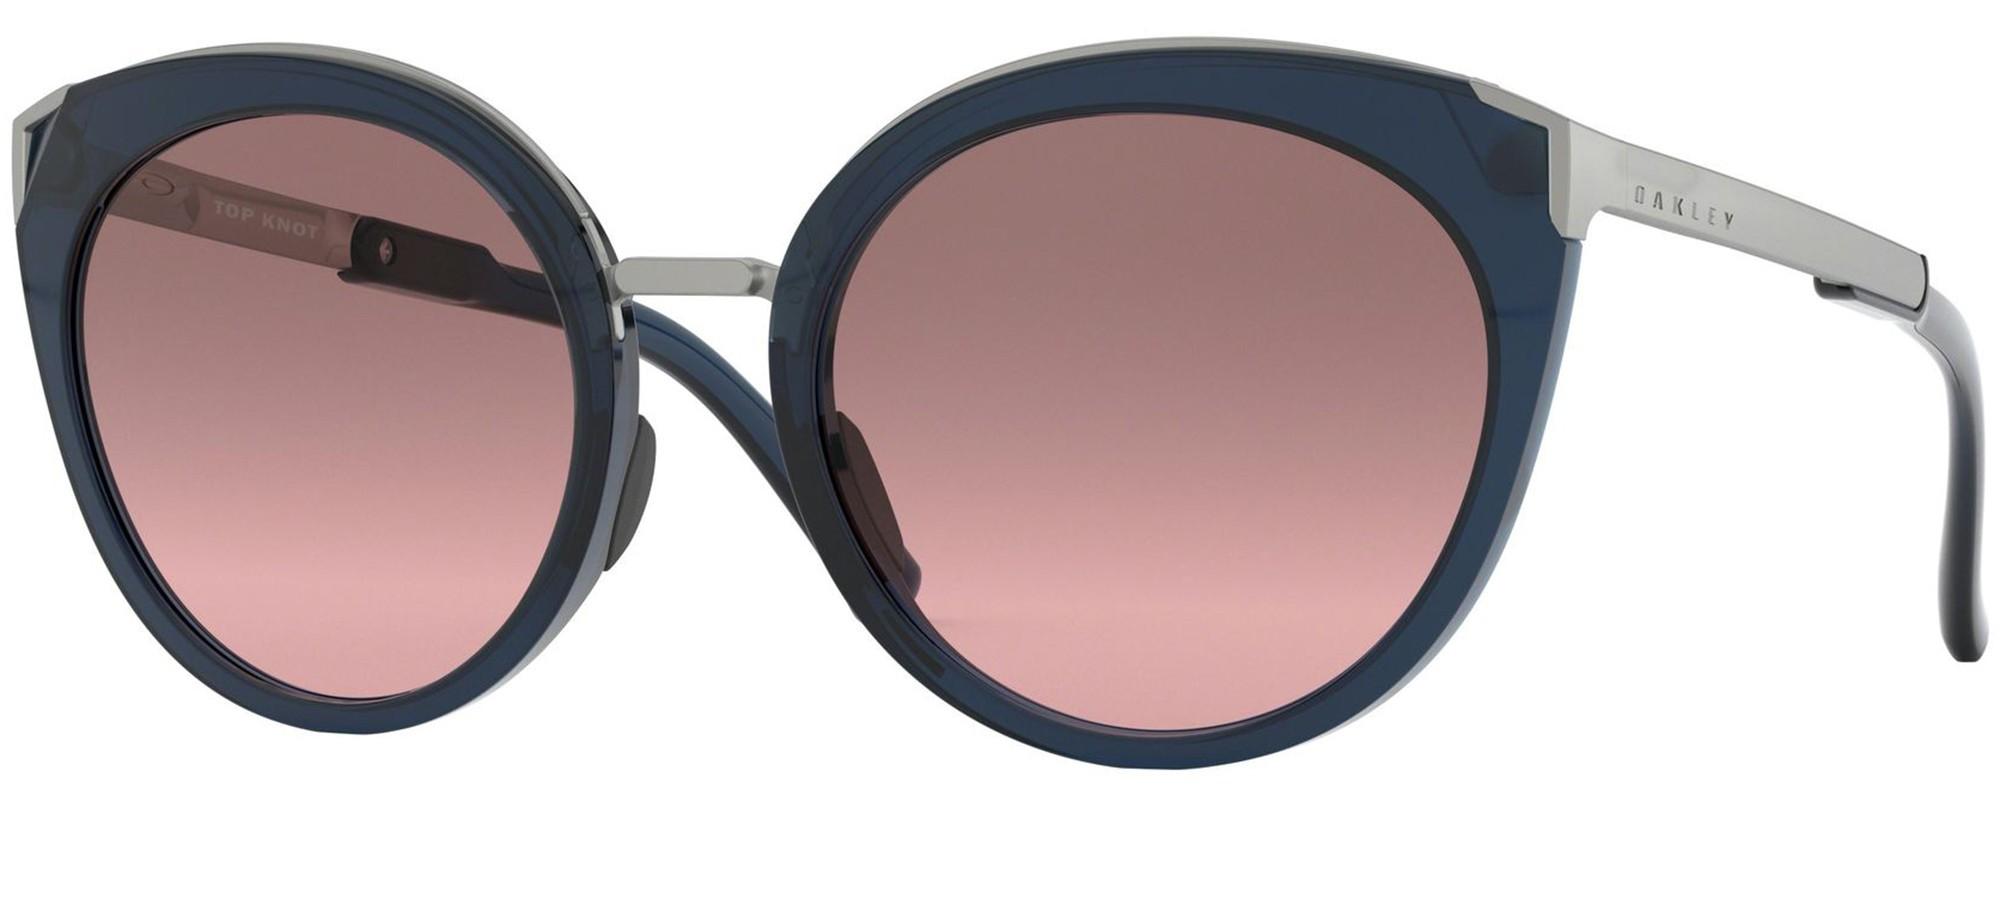 Oakley sunglasses TOP KNOT OO 9434